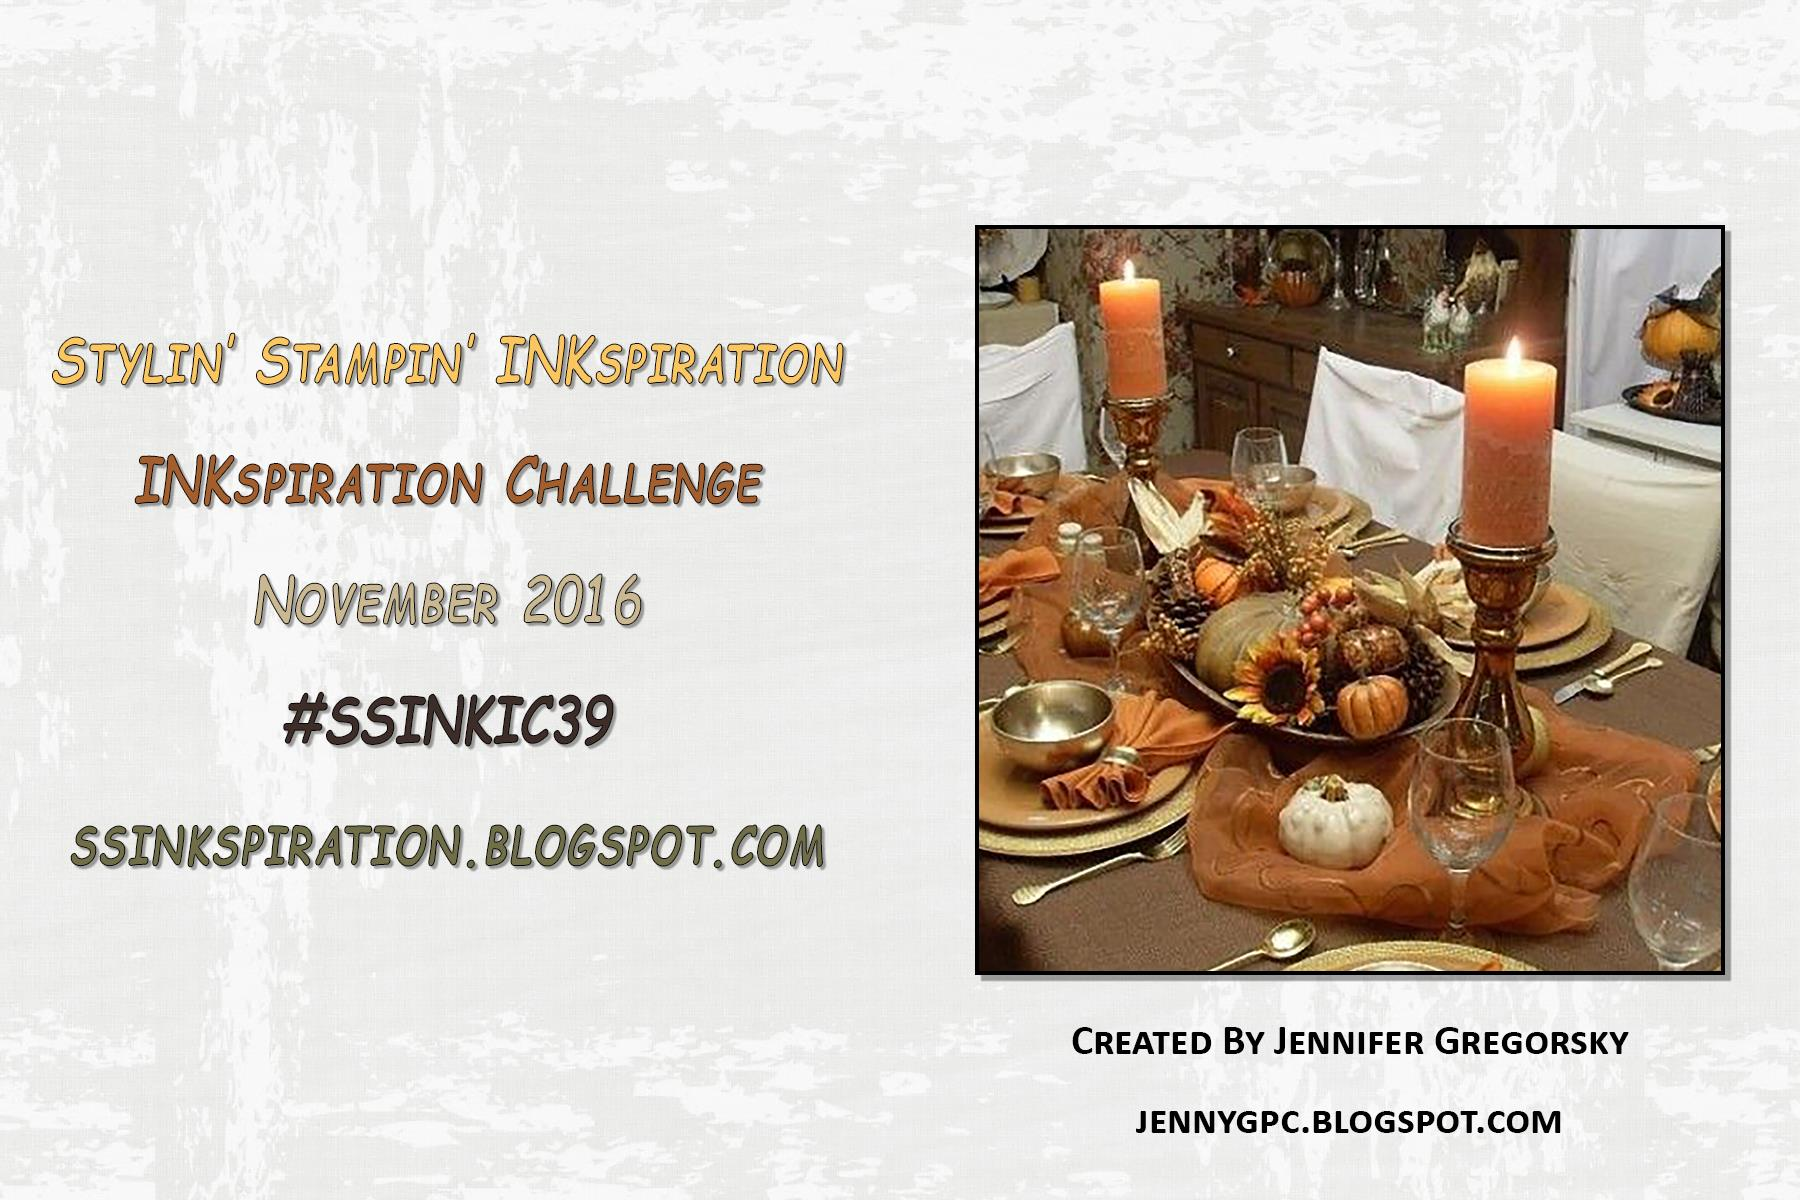 INKspiration Challenge #SSINKIC39